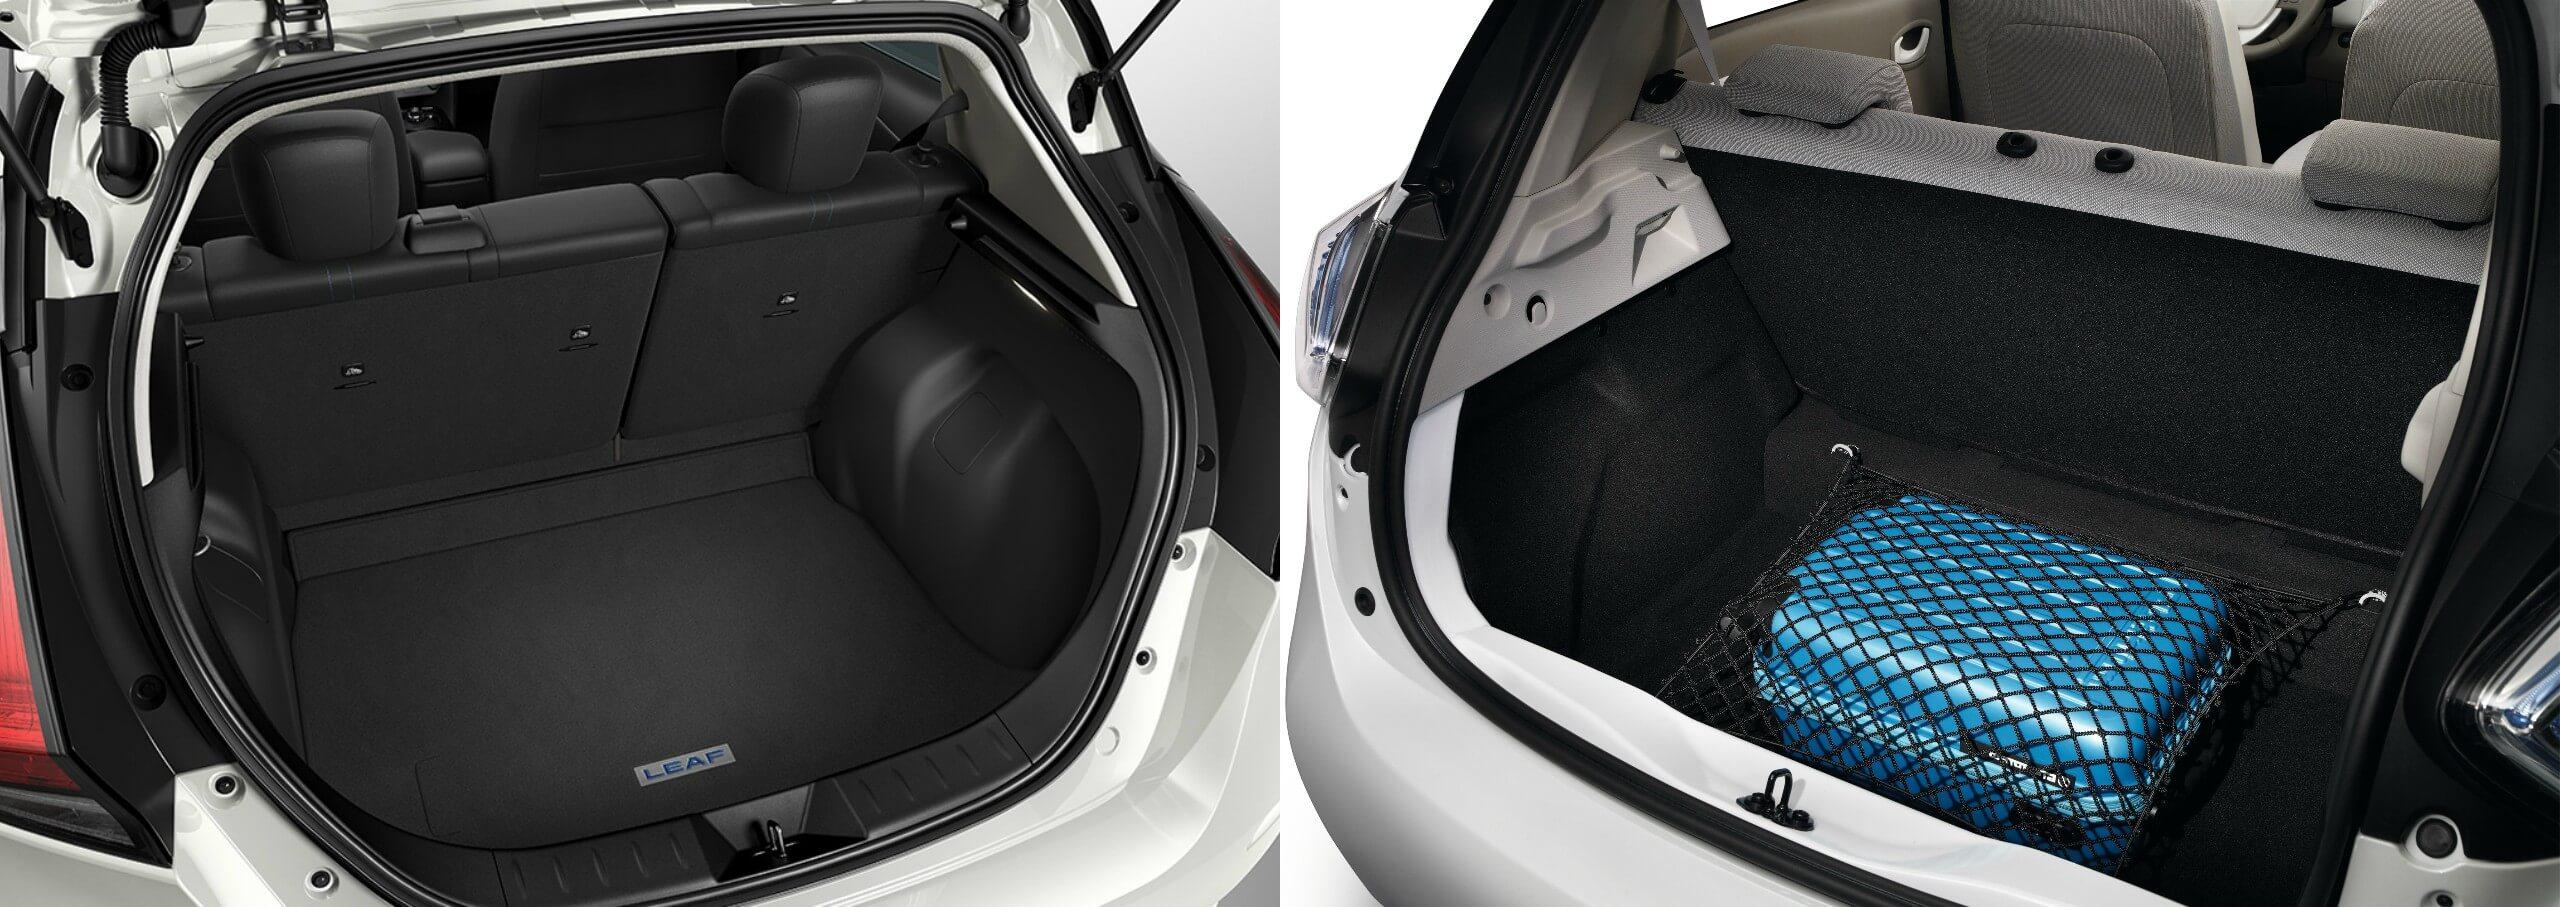 Багажник Nissan Leaf 2018 (слева) и Renault ZOE(справа)